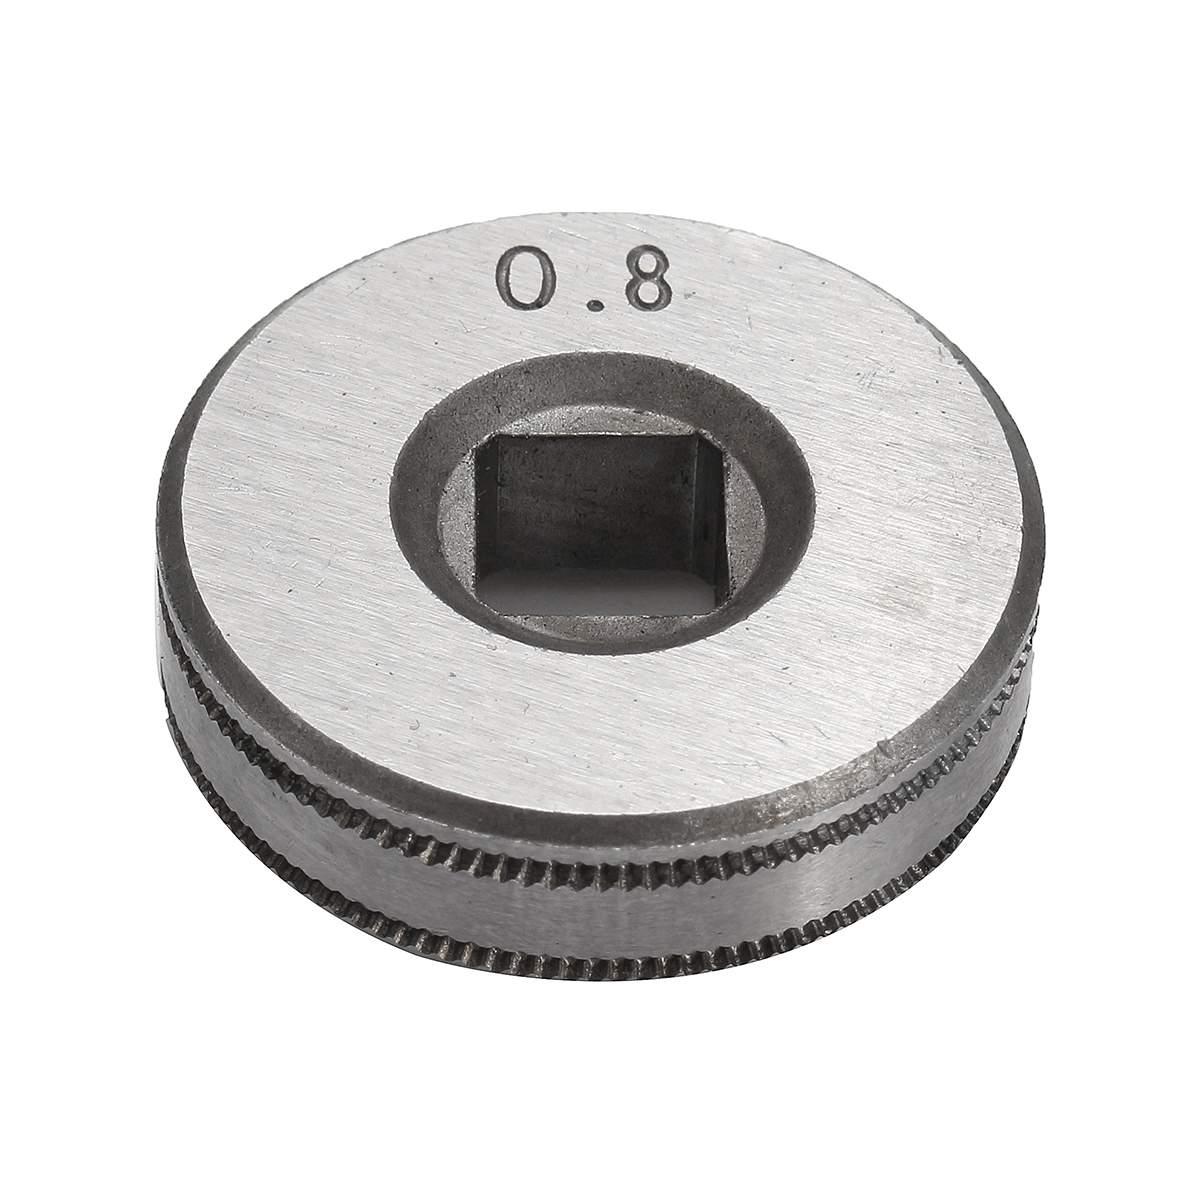 0,8 Stahl Schweißer Draht Feed Stick Roller Rolle Teile Kunrled-Nut. 023